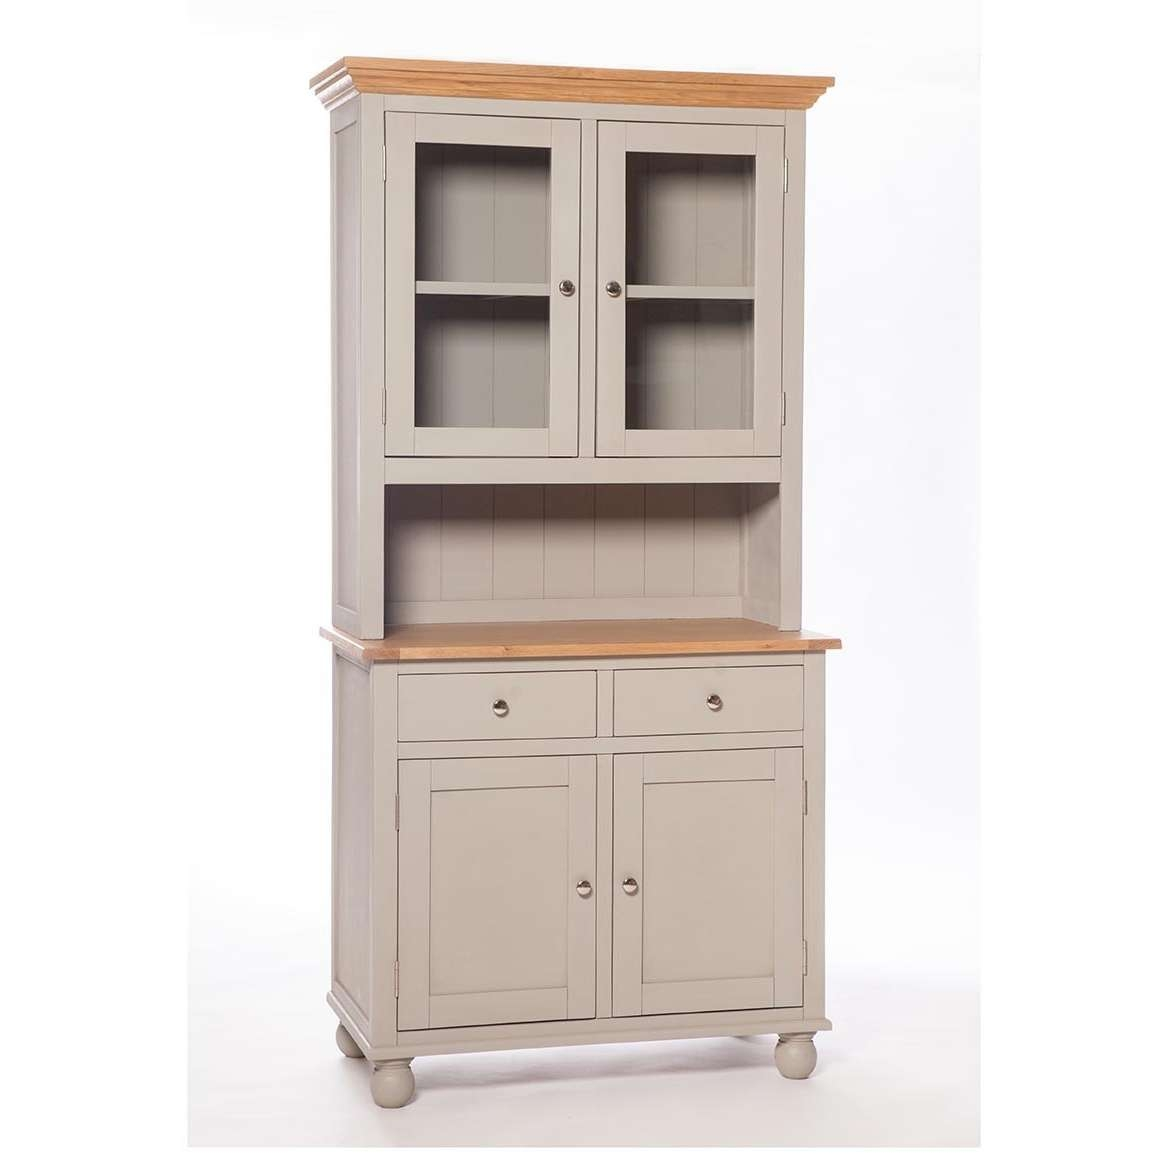 Somerset Small Kitchen Dresser | Woodlands Furniture Regarding Narrow Kitchen Sideboards (View 7 of 20)